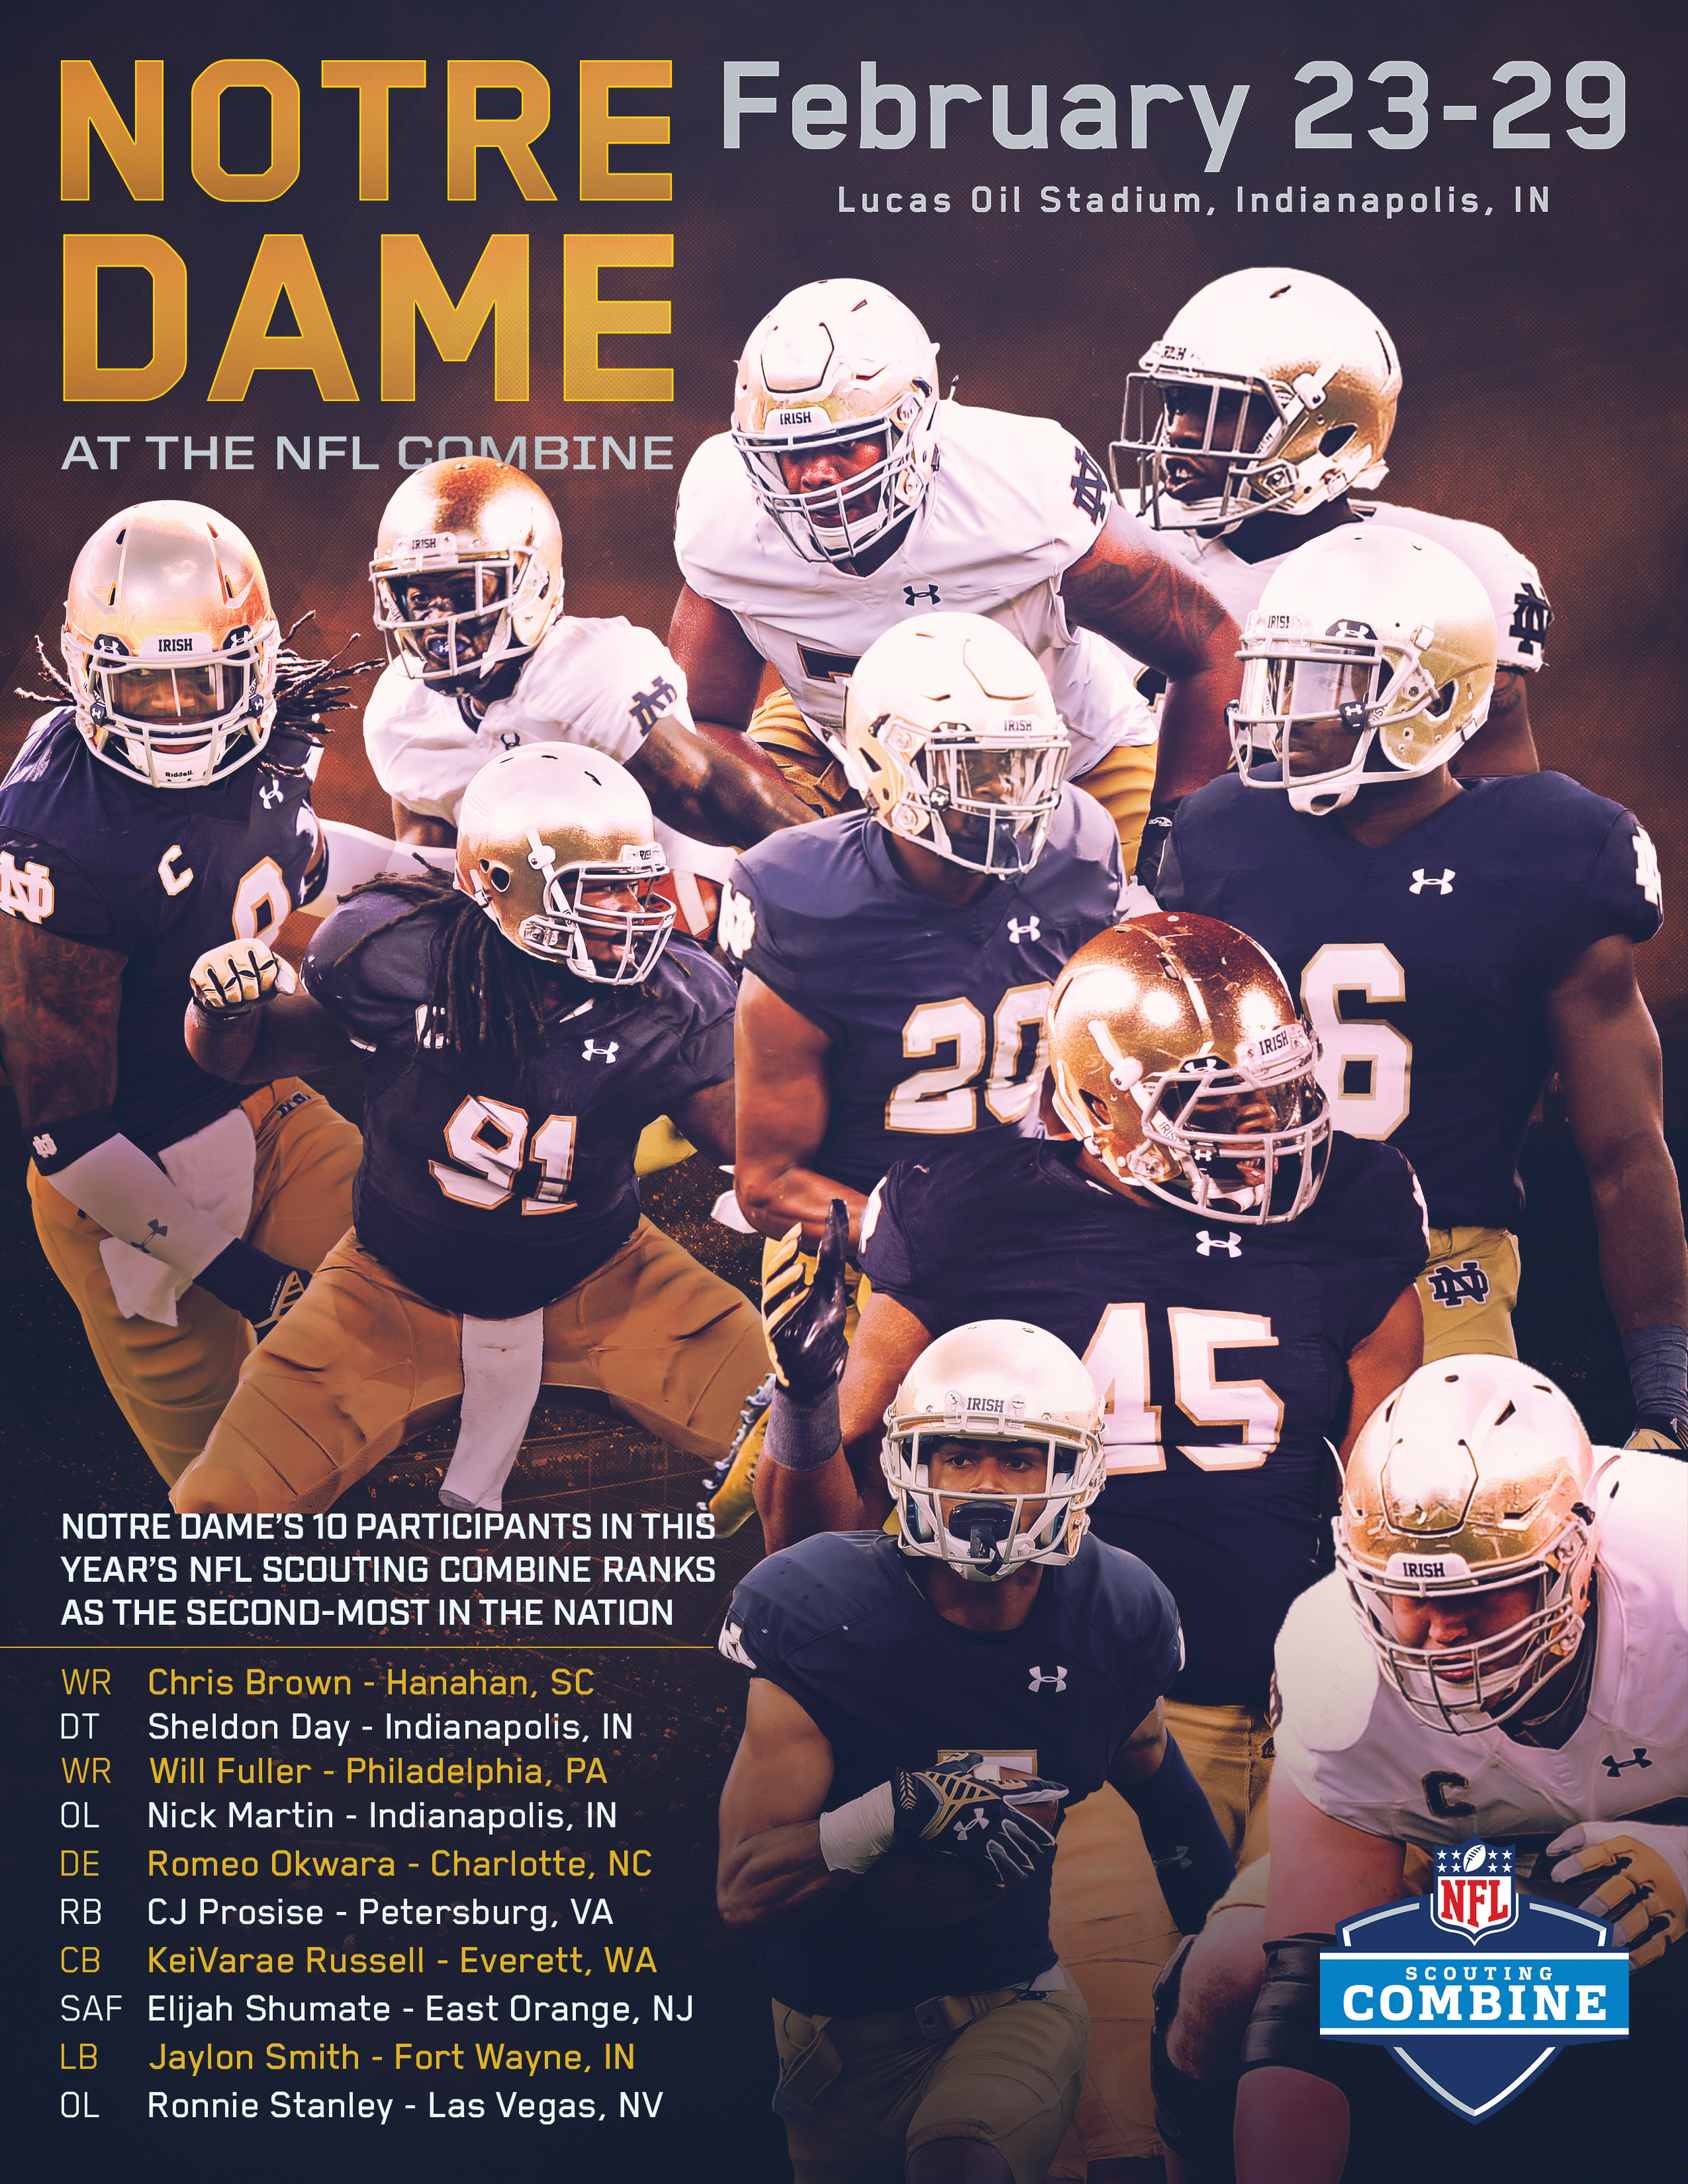 Notre Dame NFL Combine